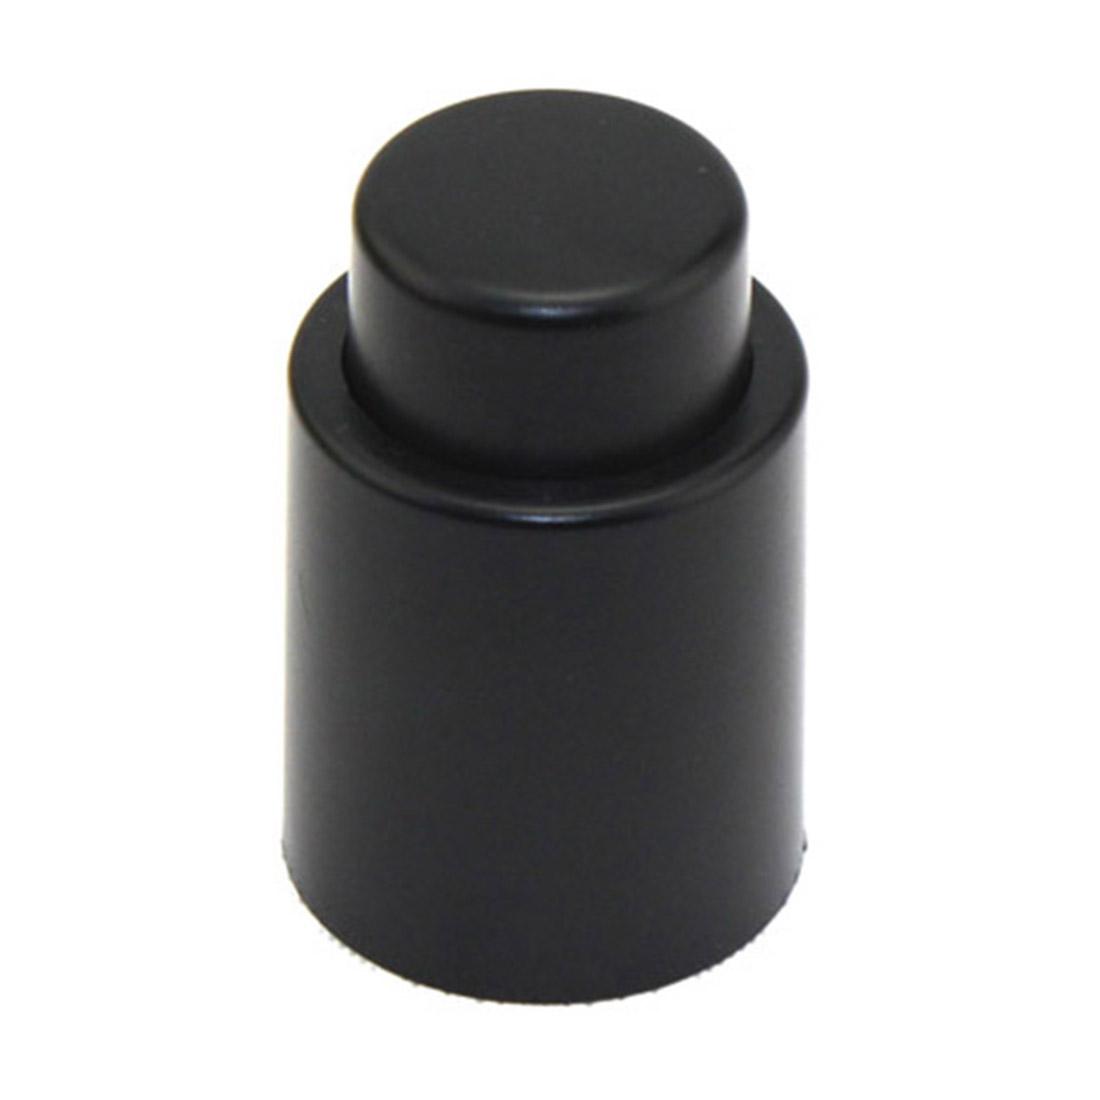 Vacuum Sealed Wine Champagne Bottle Stopper Cap Cork Black